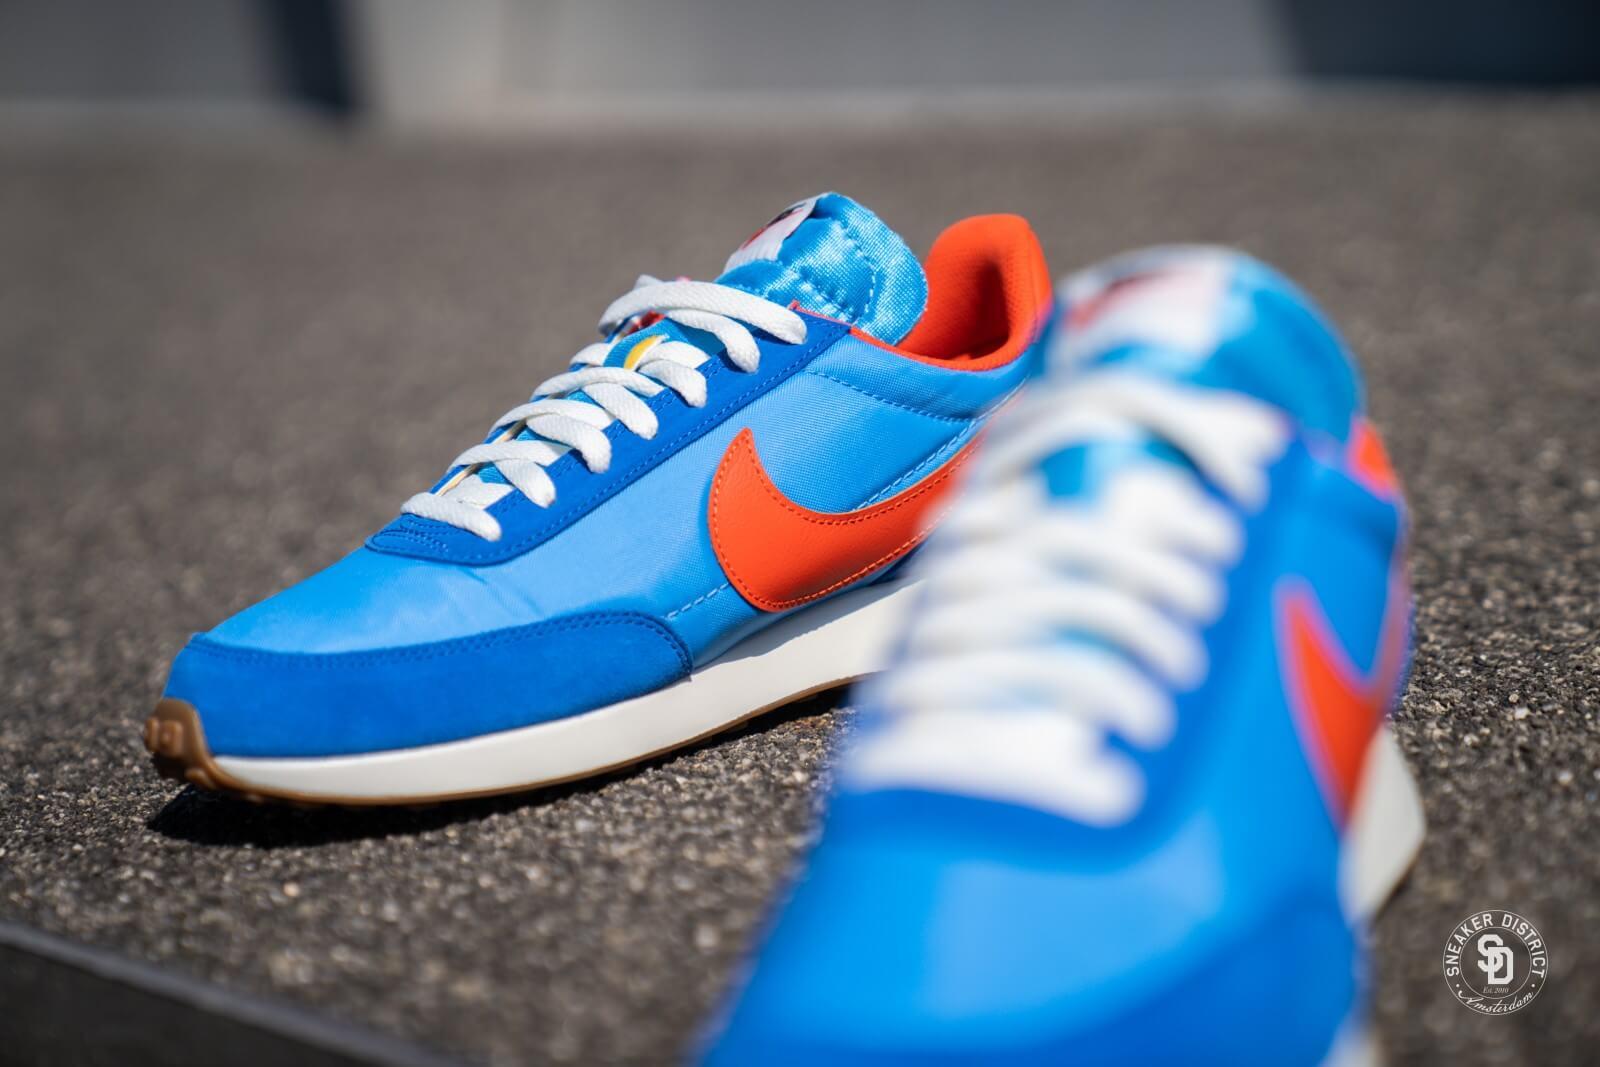 Nike Air Tailwind 79 Pacific BlueTeam Orange University Blue 487754 408